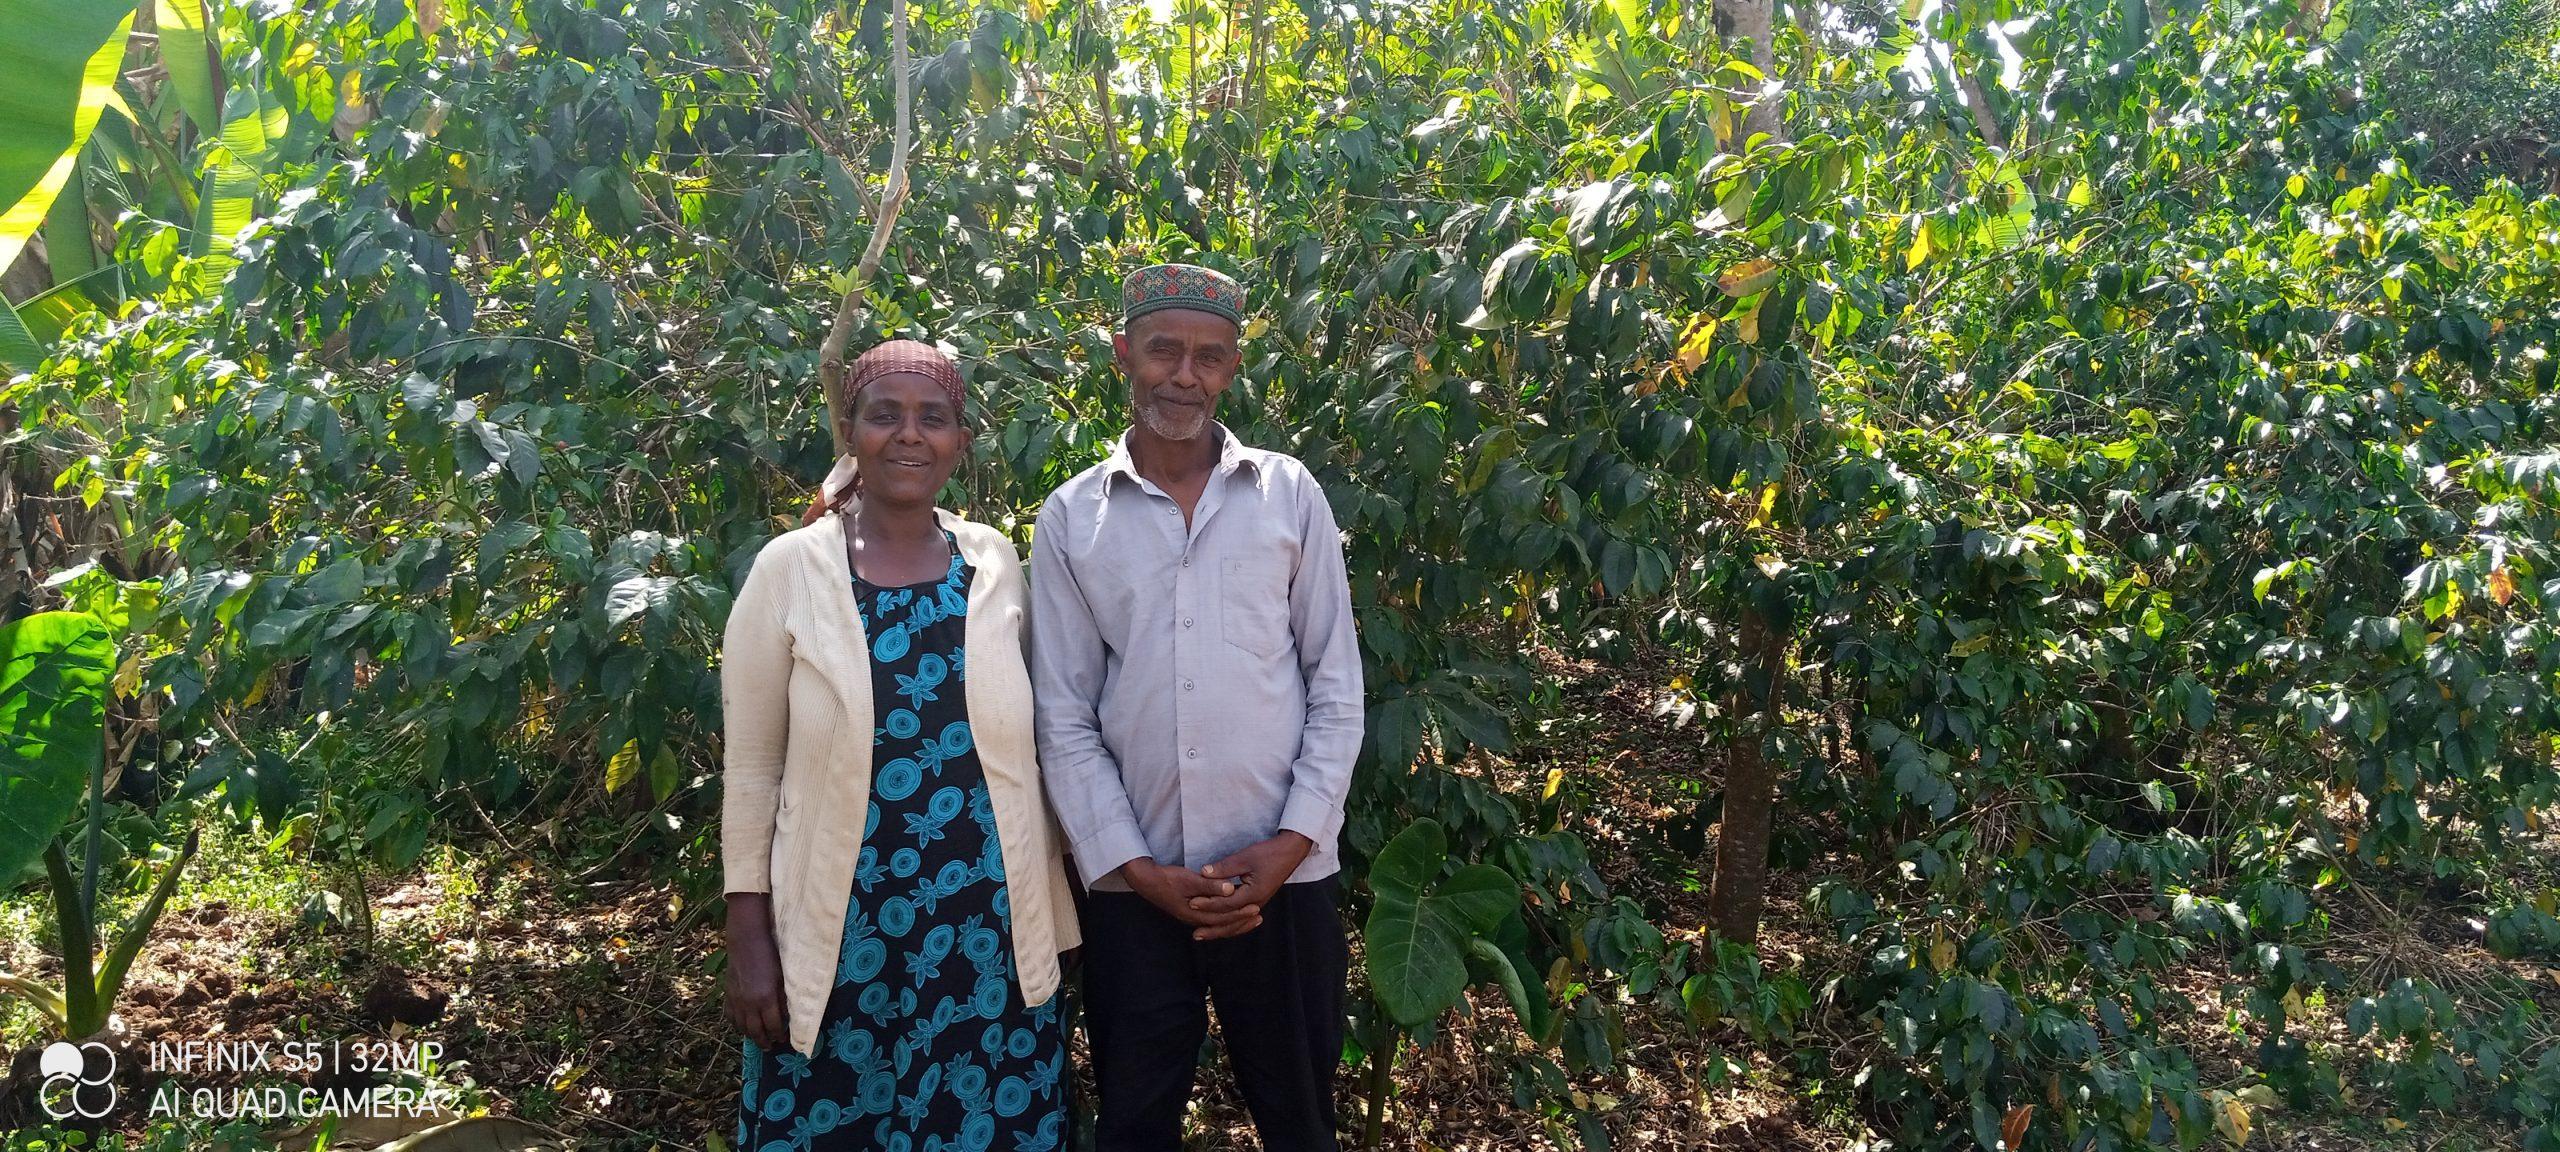 Fedila Hussein and Mustafa Tesfaye, two coffee farmers in Ethiopia, stand in front of their coffee trees.